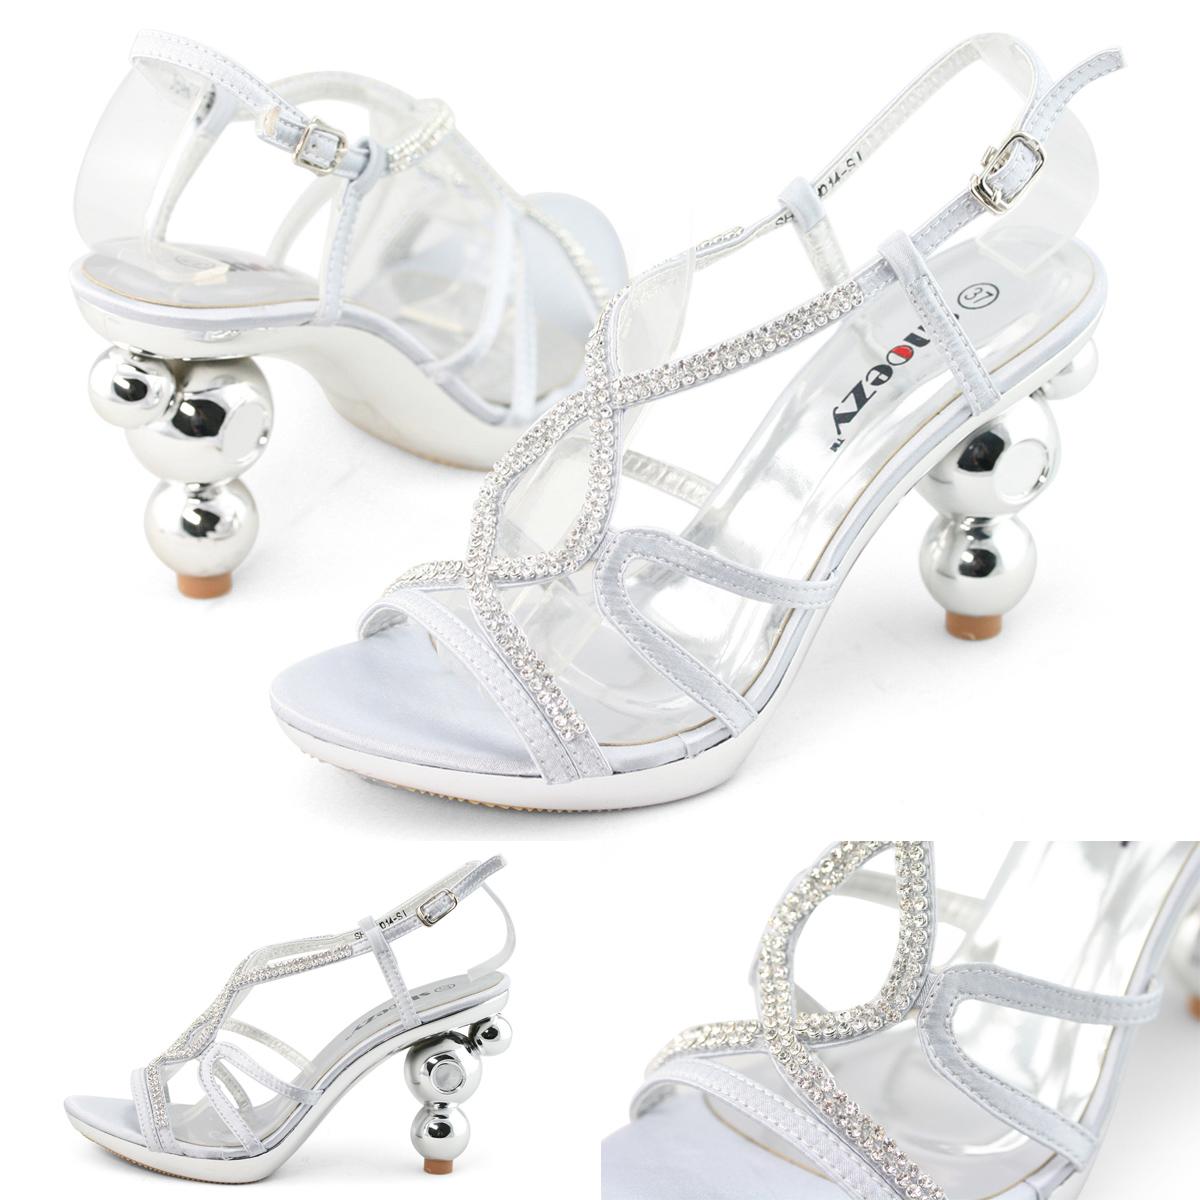 SHOEZY-Cheap-Womens-Silver-Diamond-Platform-Pumps-Block-High-Heels-Sandals-Shoes